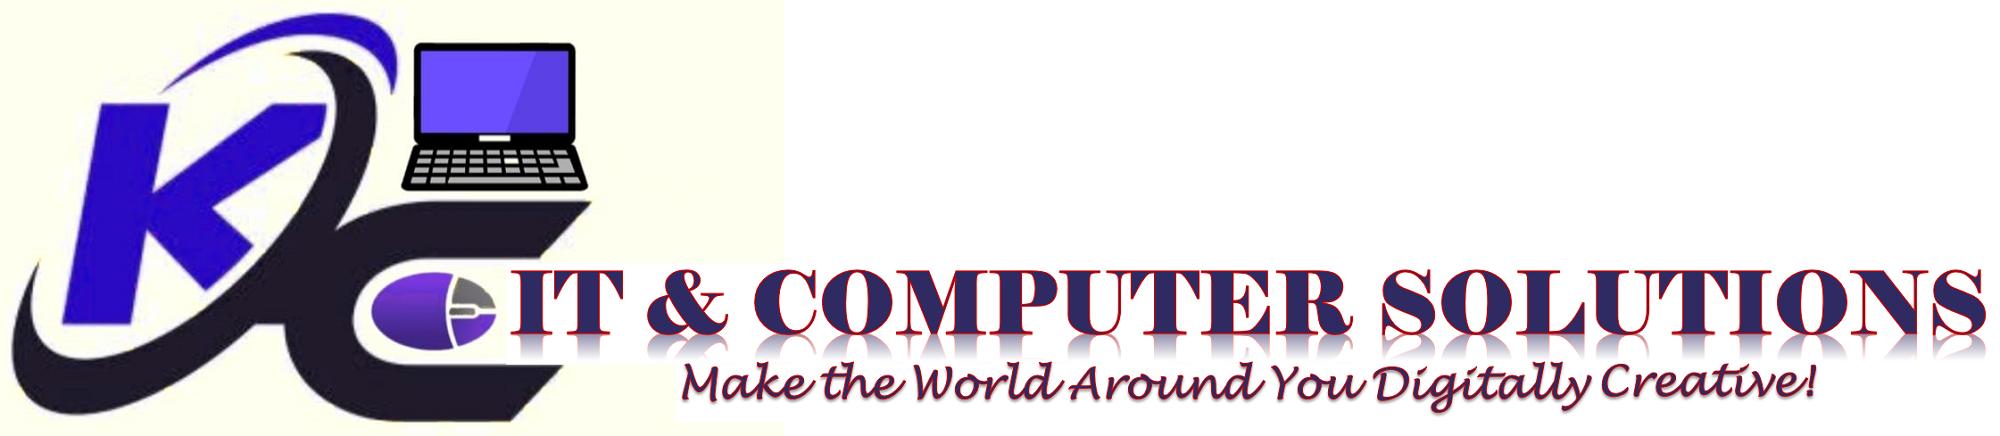 KC IT & COMPUTER SOLUTIONS